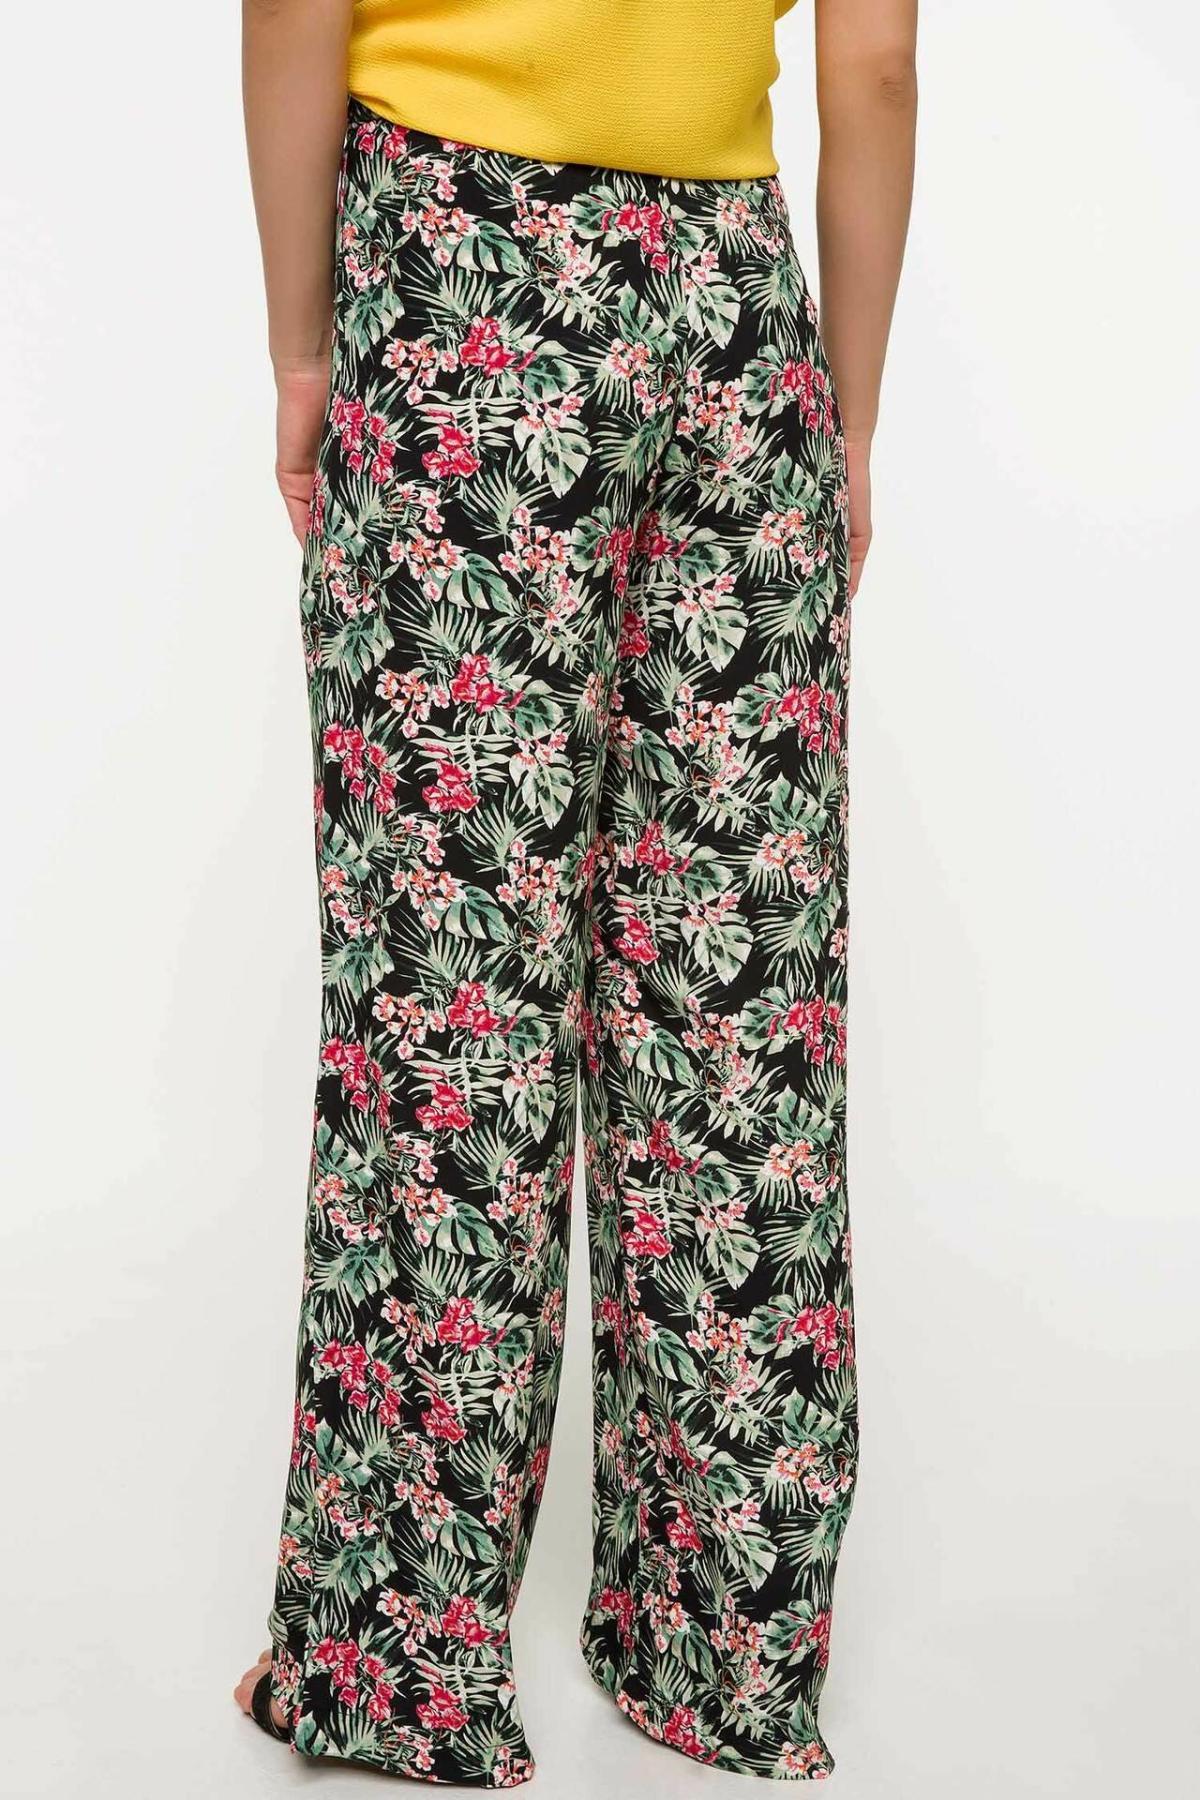 DeFacto Ladies Casual Trousers Female Fashion Comfort Wide-leg Pants Harajuku Print Long Pant Loose Simple New - J1708AZ18SM